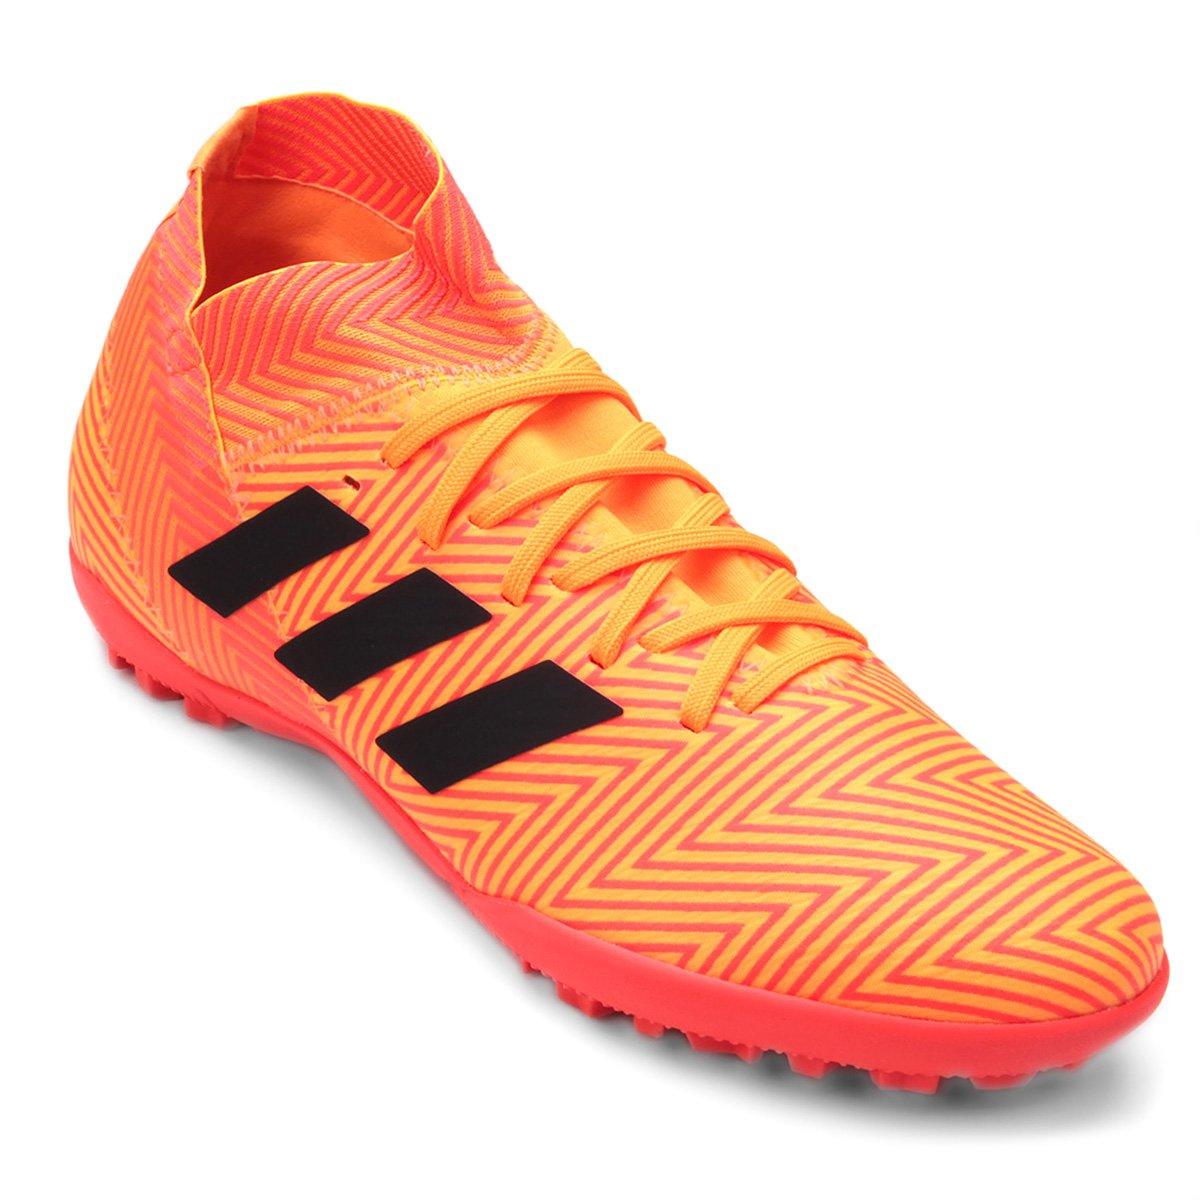 d06fc87abd Chuteira Society Adidas Nemeziz Tango 18 3 TF - Laranja e Preto ...